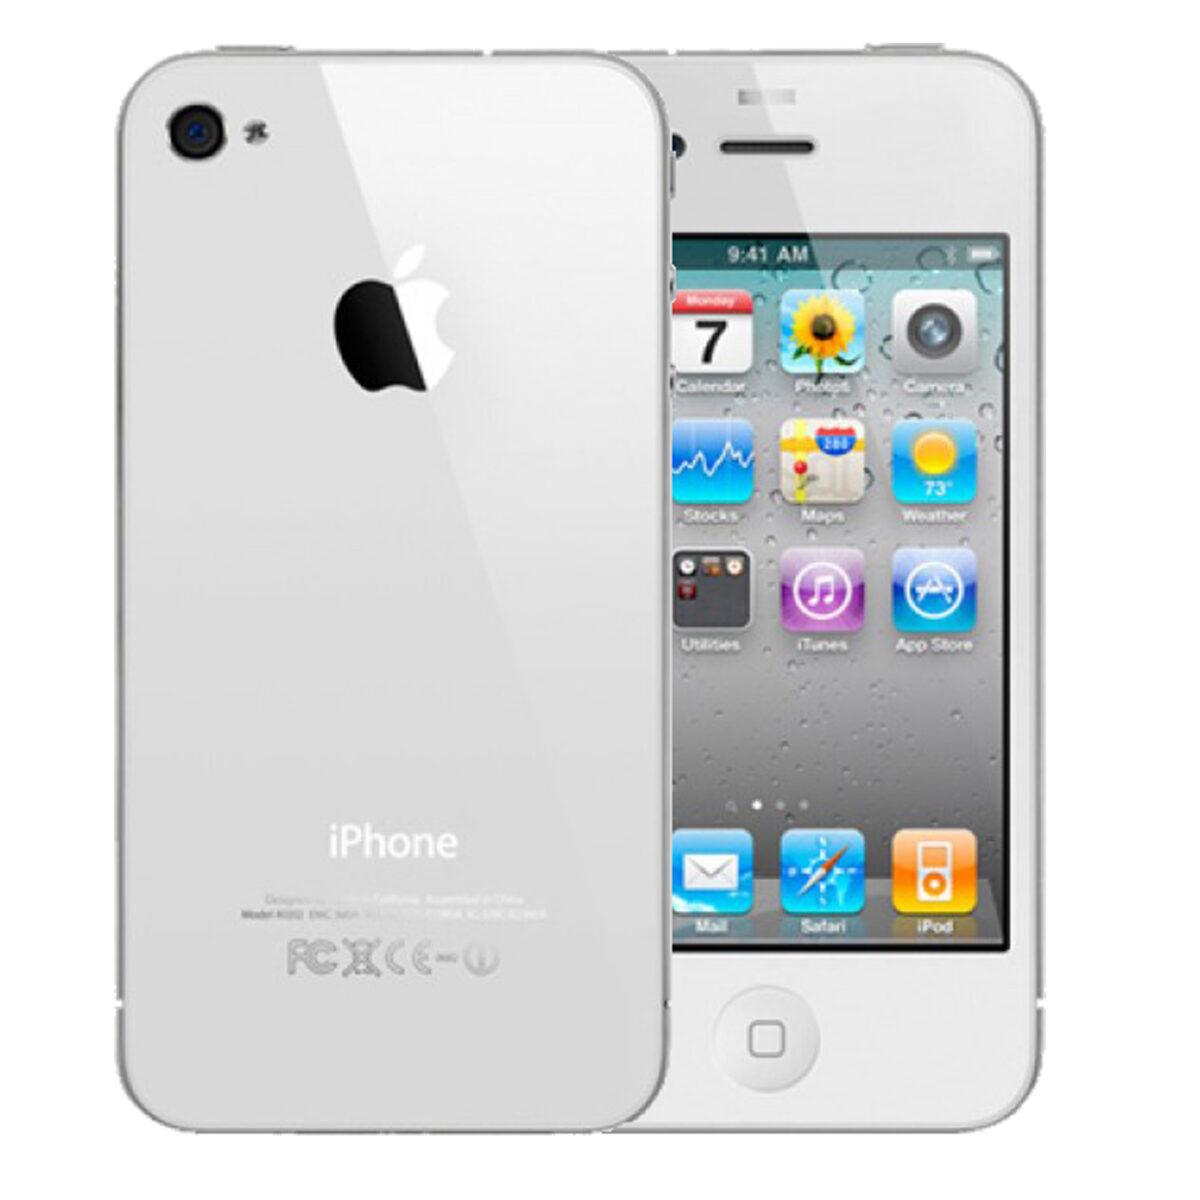 iphone 4s reparatur display